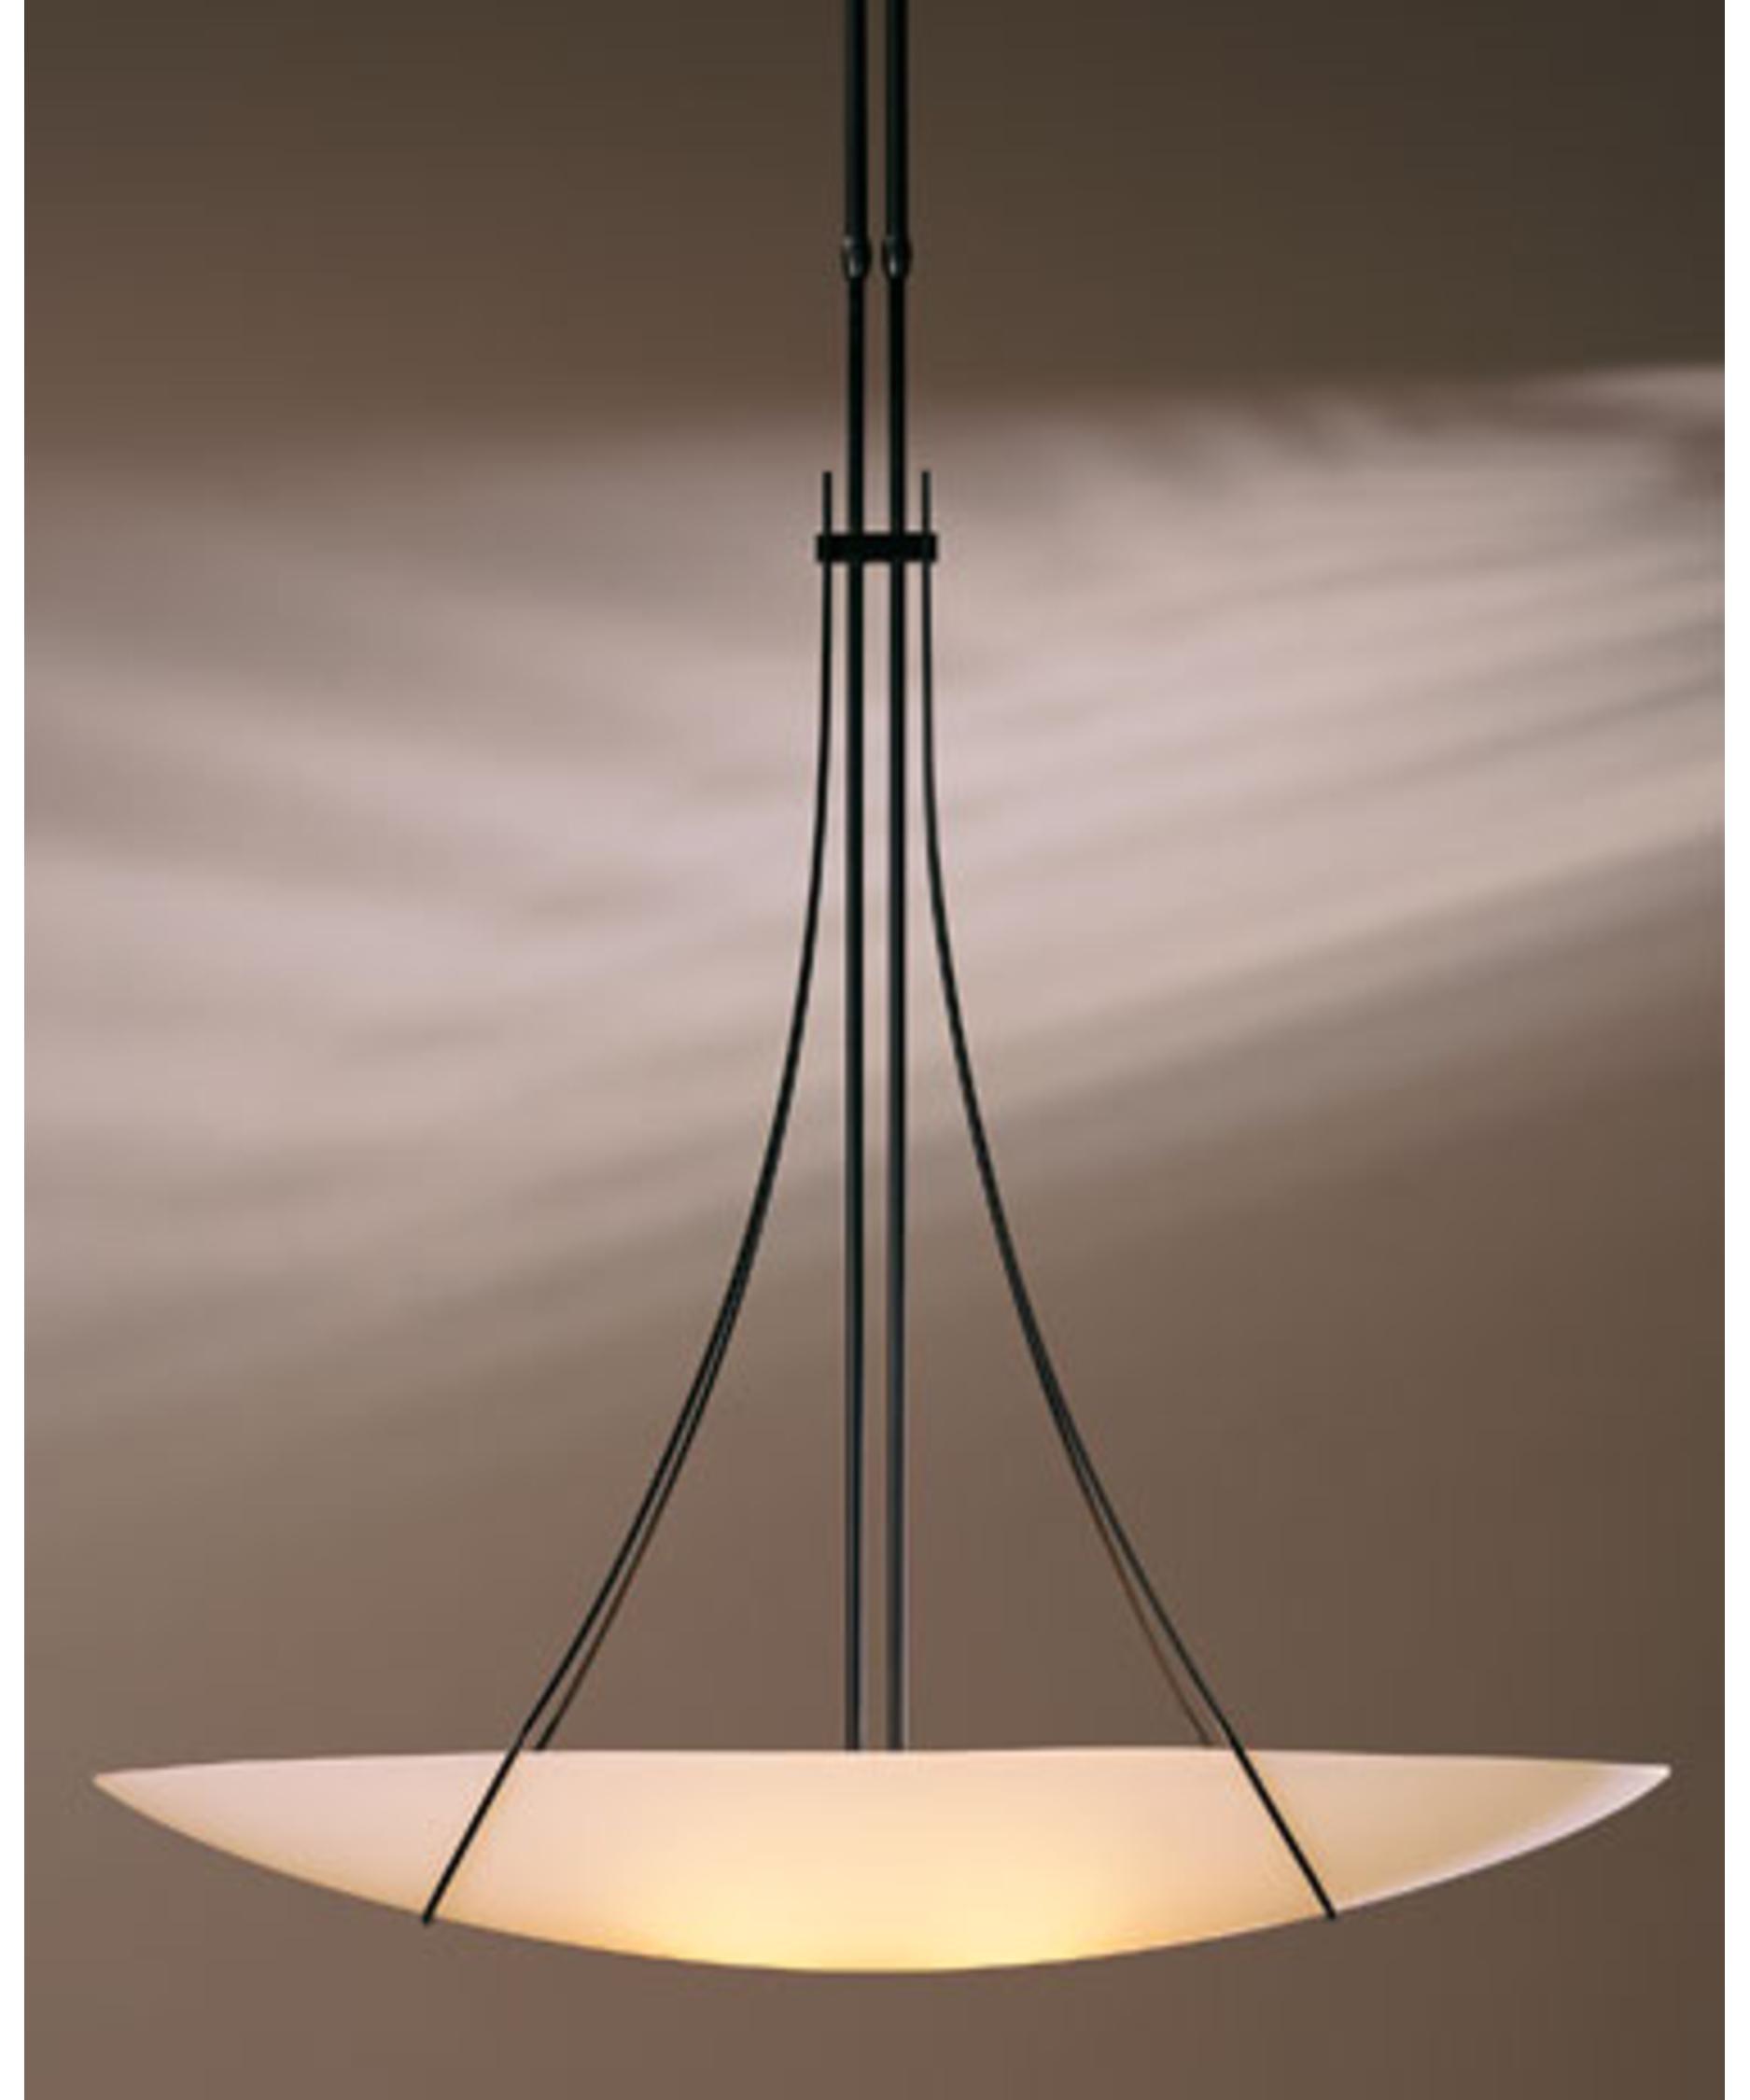 hubbardton forge draped loop 38 inch wide 2 light large pendant capitol lighting - Hubbardton Forge